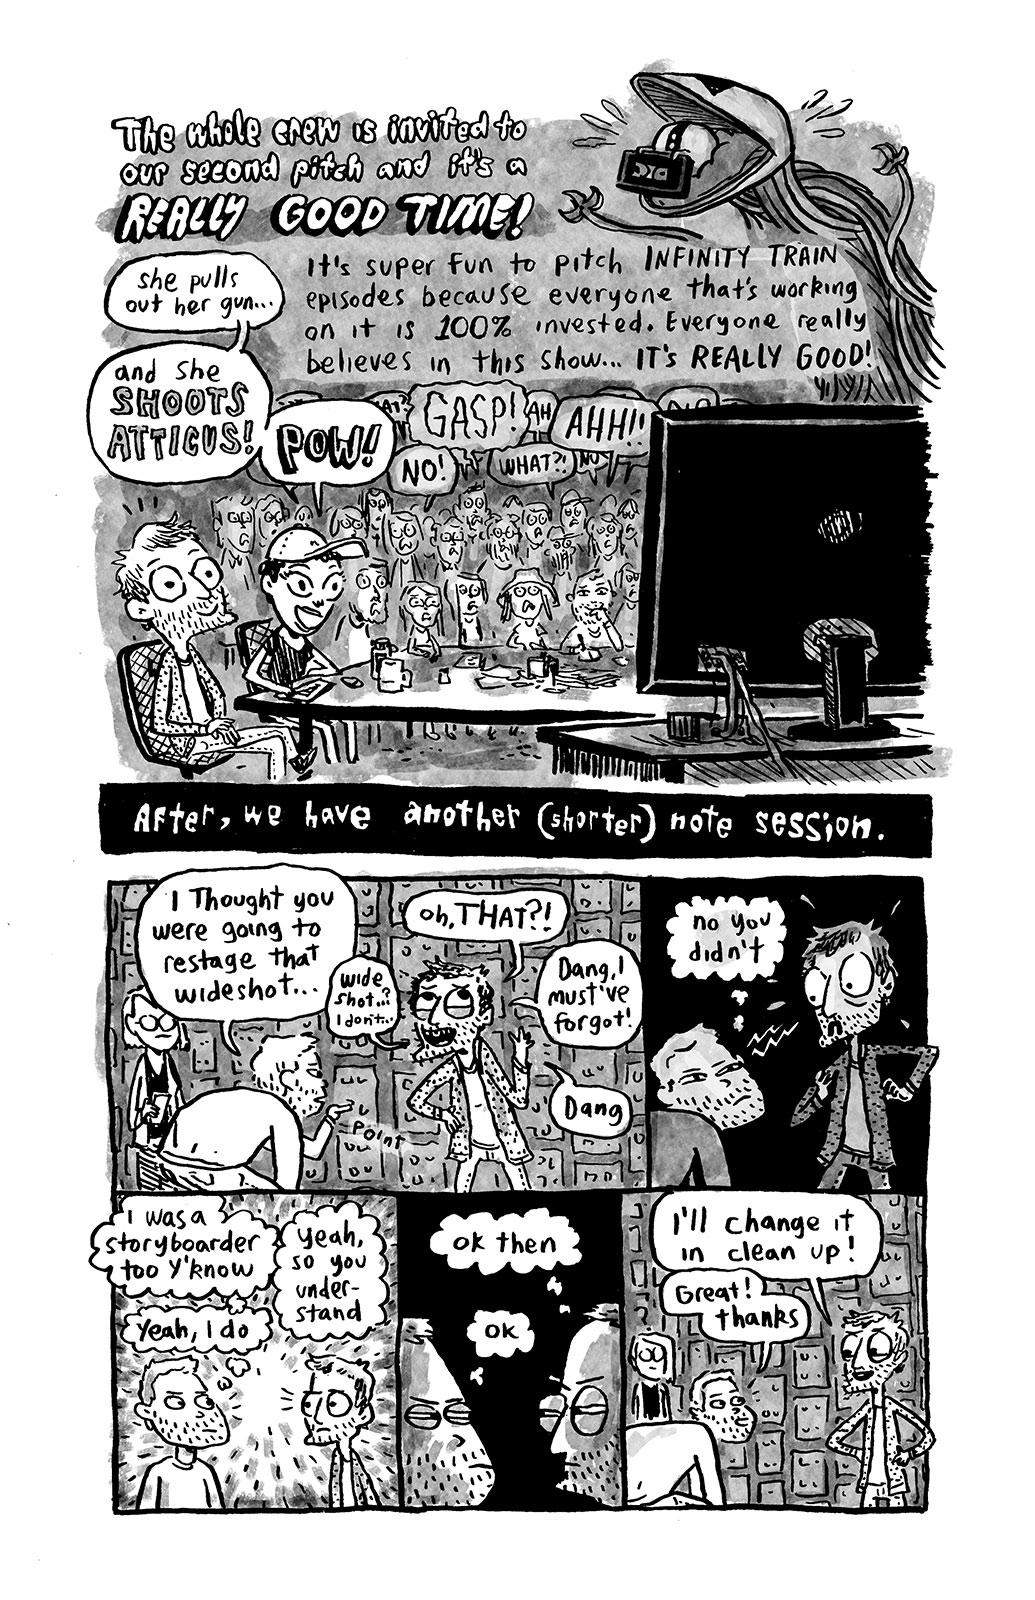 Infinity Train comic by Sam Spina